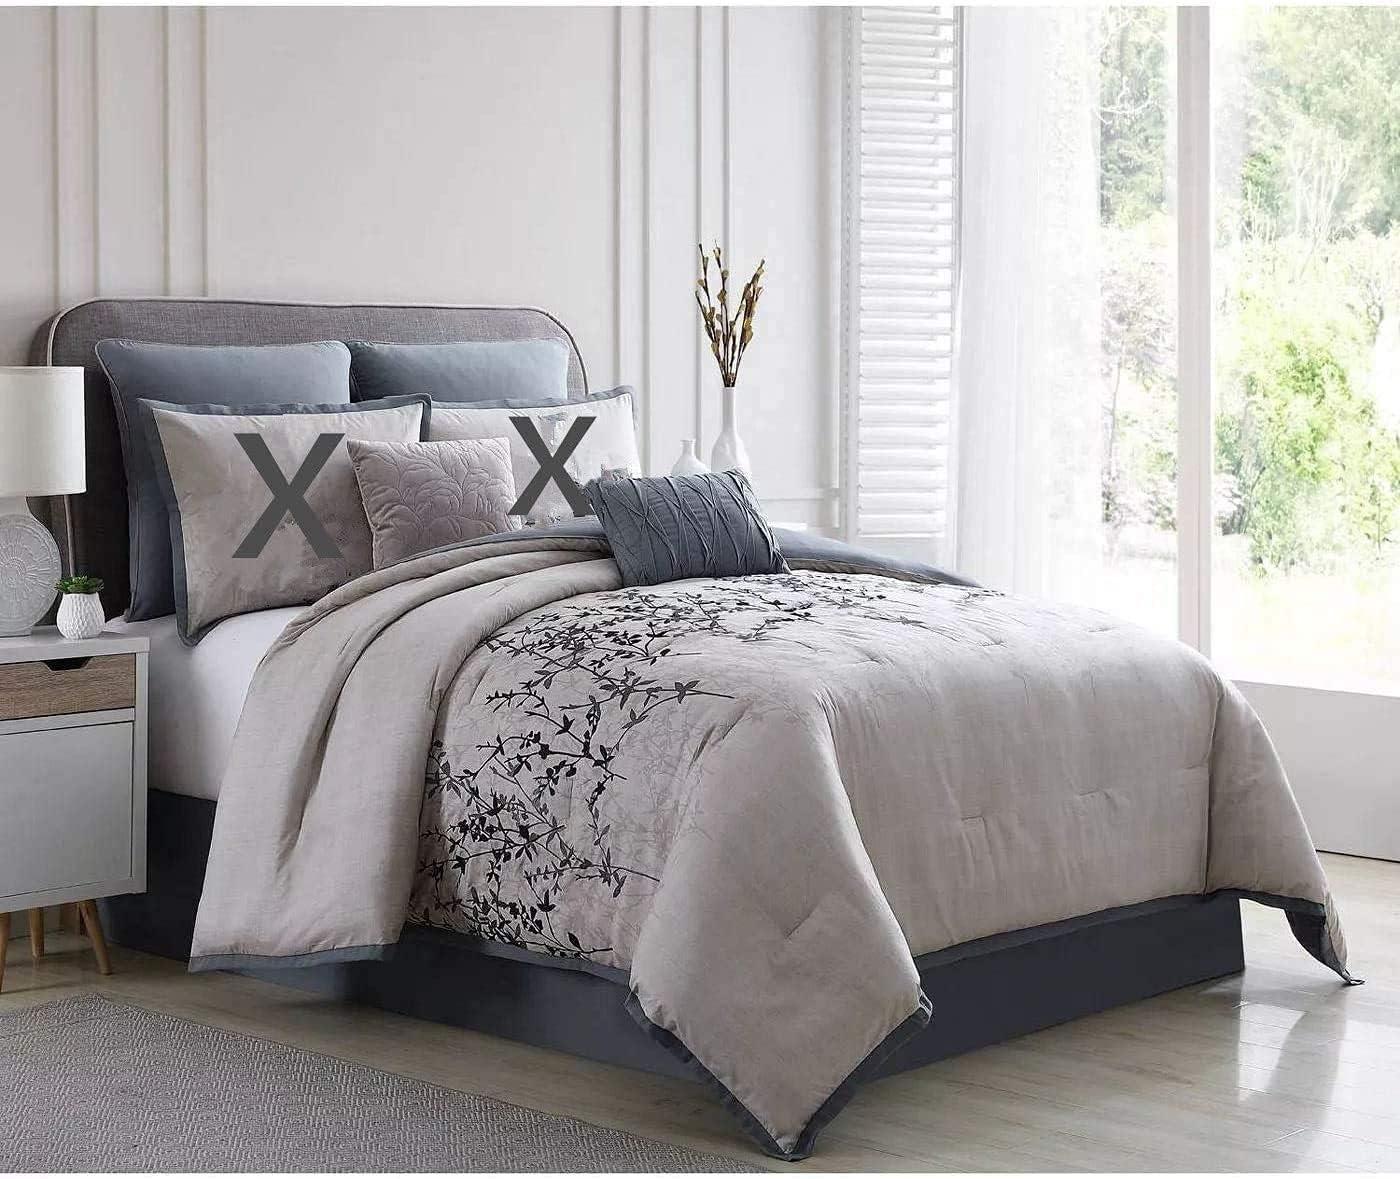 Comforter Set Black White and Finally resale start Grey Large discharge sale Gray Printed Modern Pattern